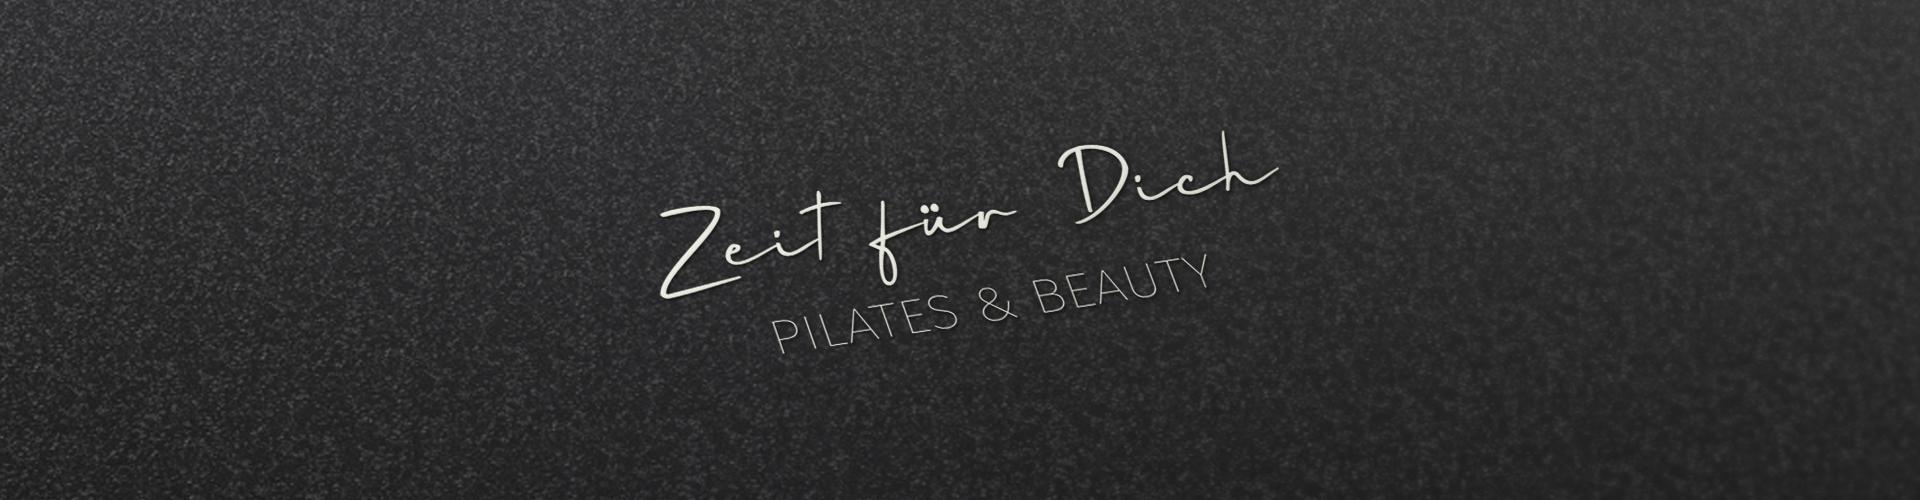 Zeit für Dich - Pilates & Beauty Moodbild Logo